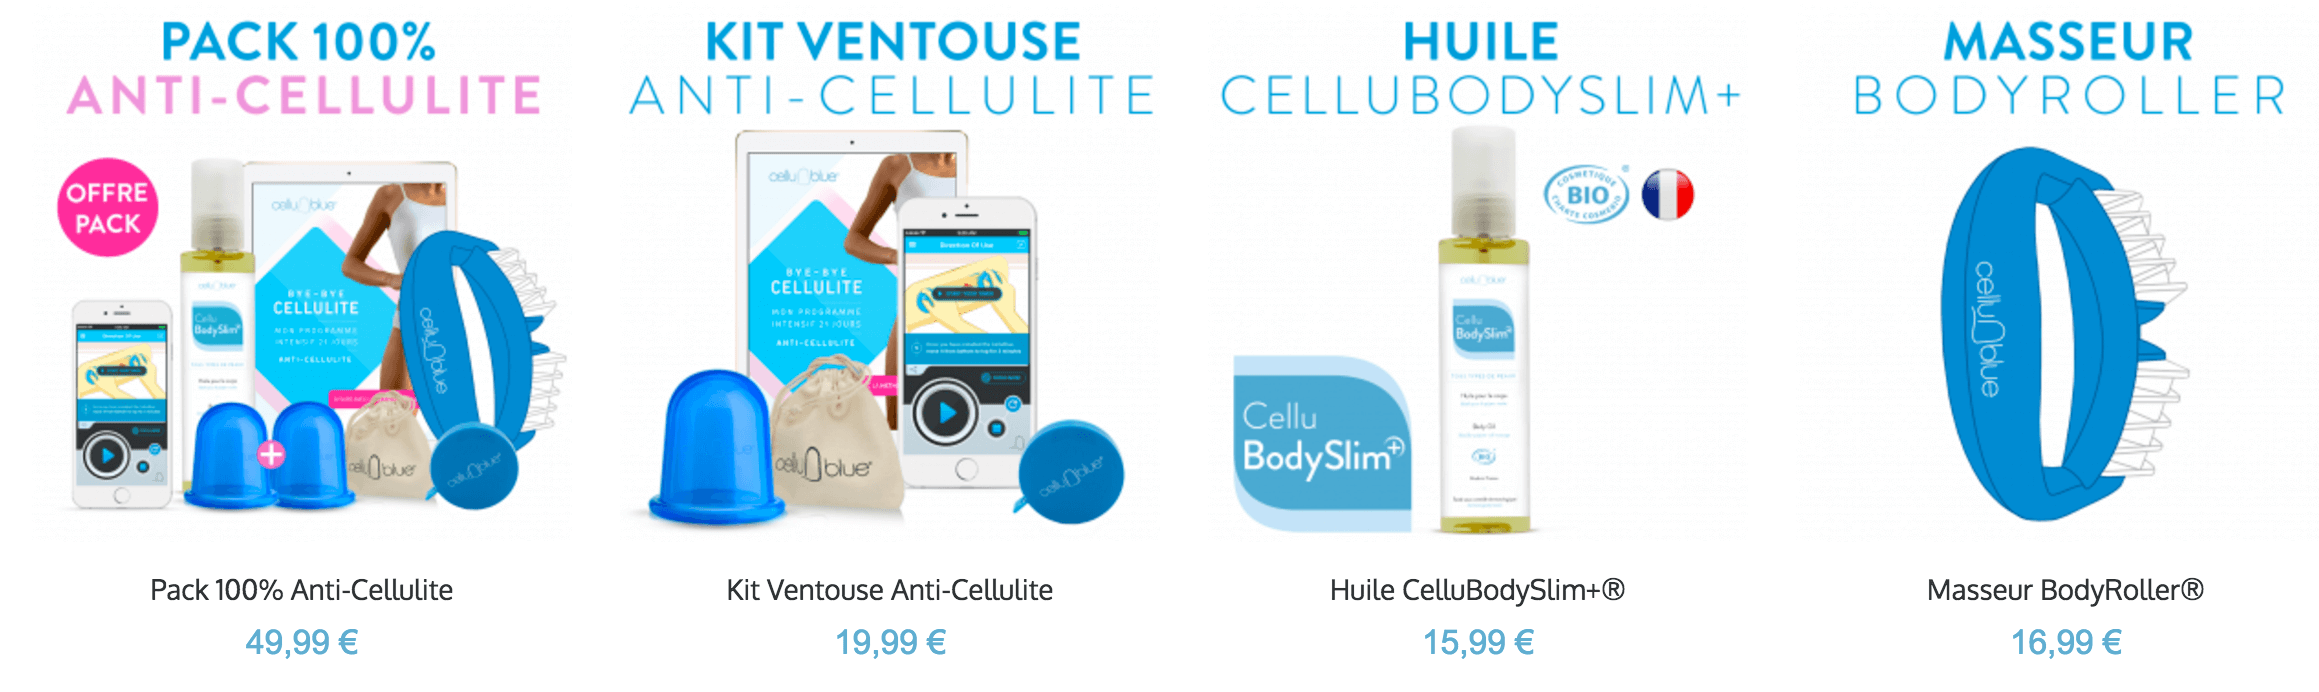 makeupbyazadig-cellublue-ventouse anti cellulite-avis